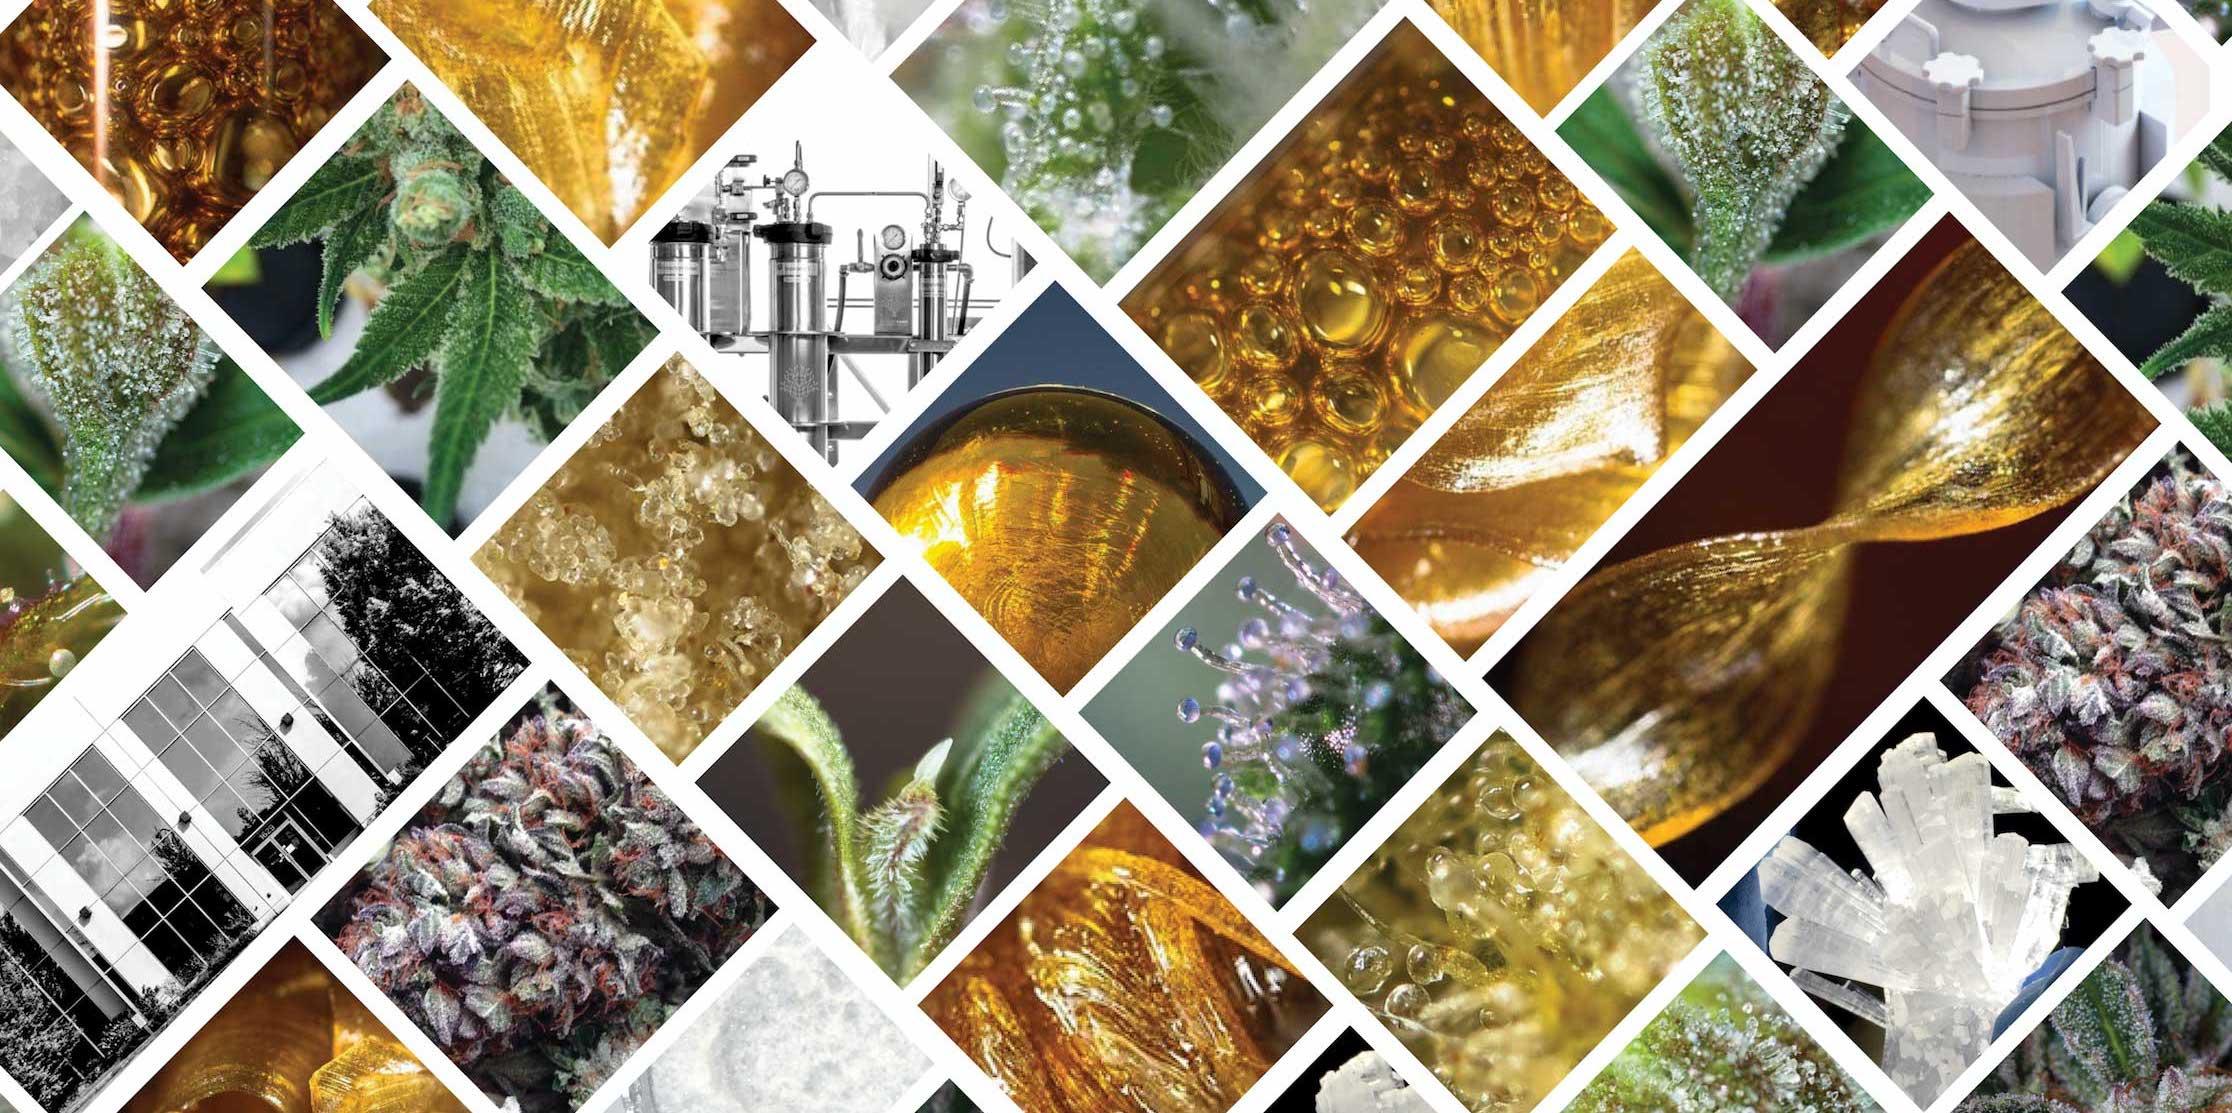 THC extraction,  CBD extraction,  rosin extraction,  kief extraction,